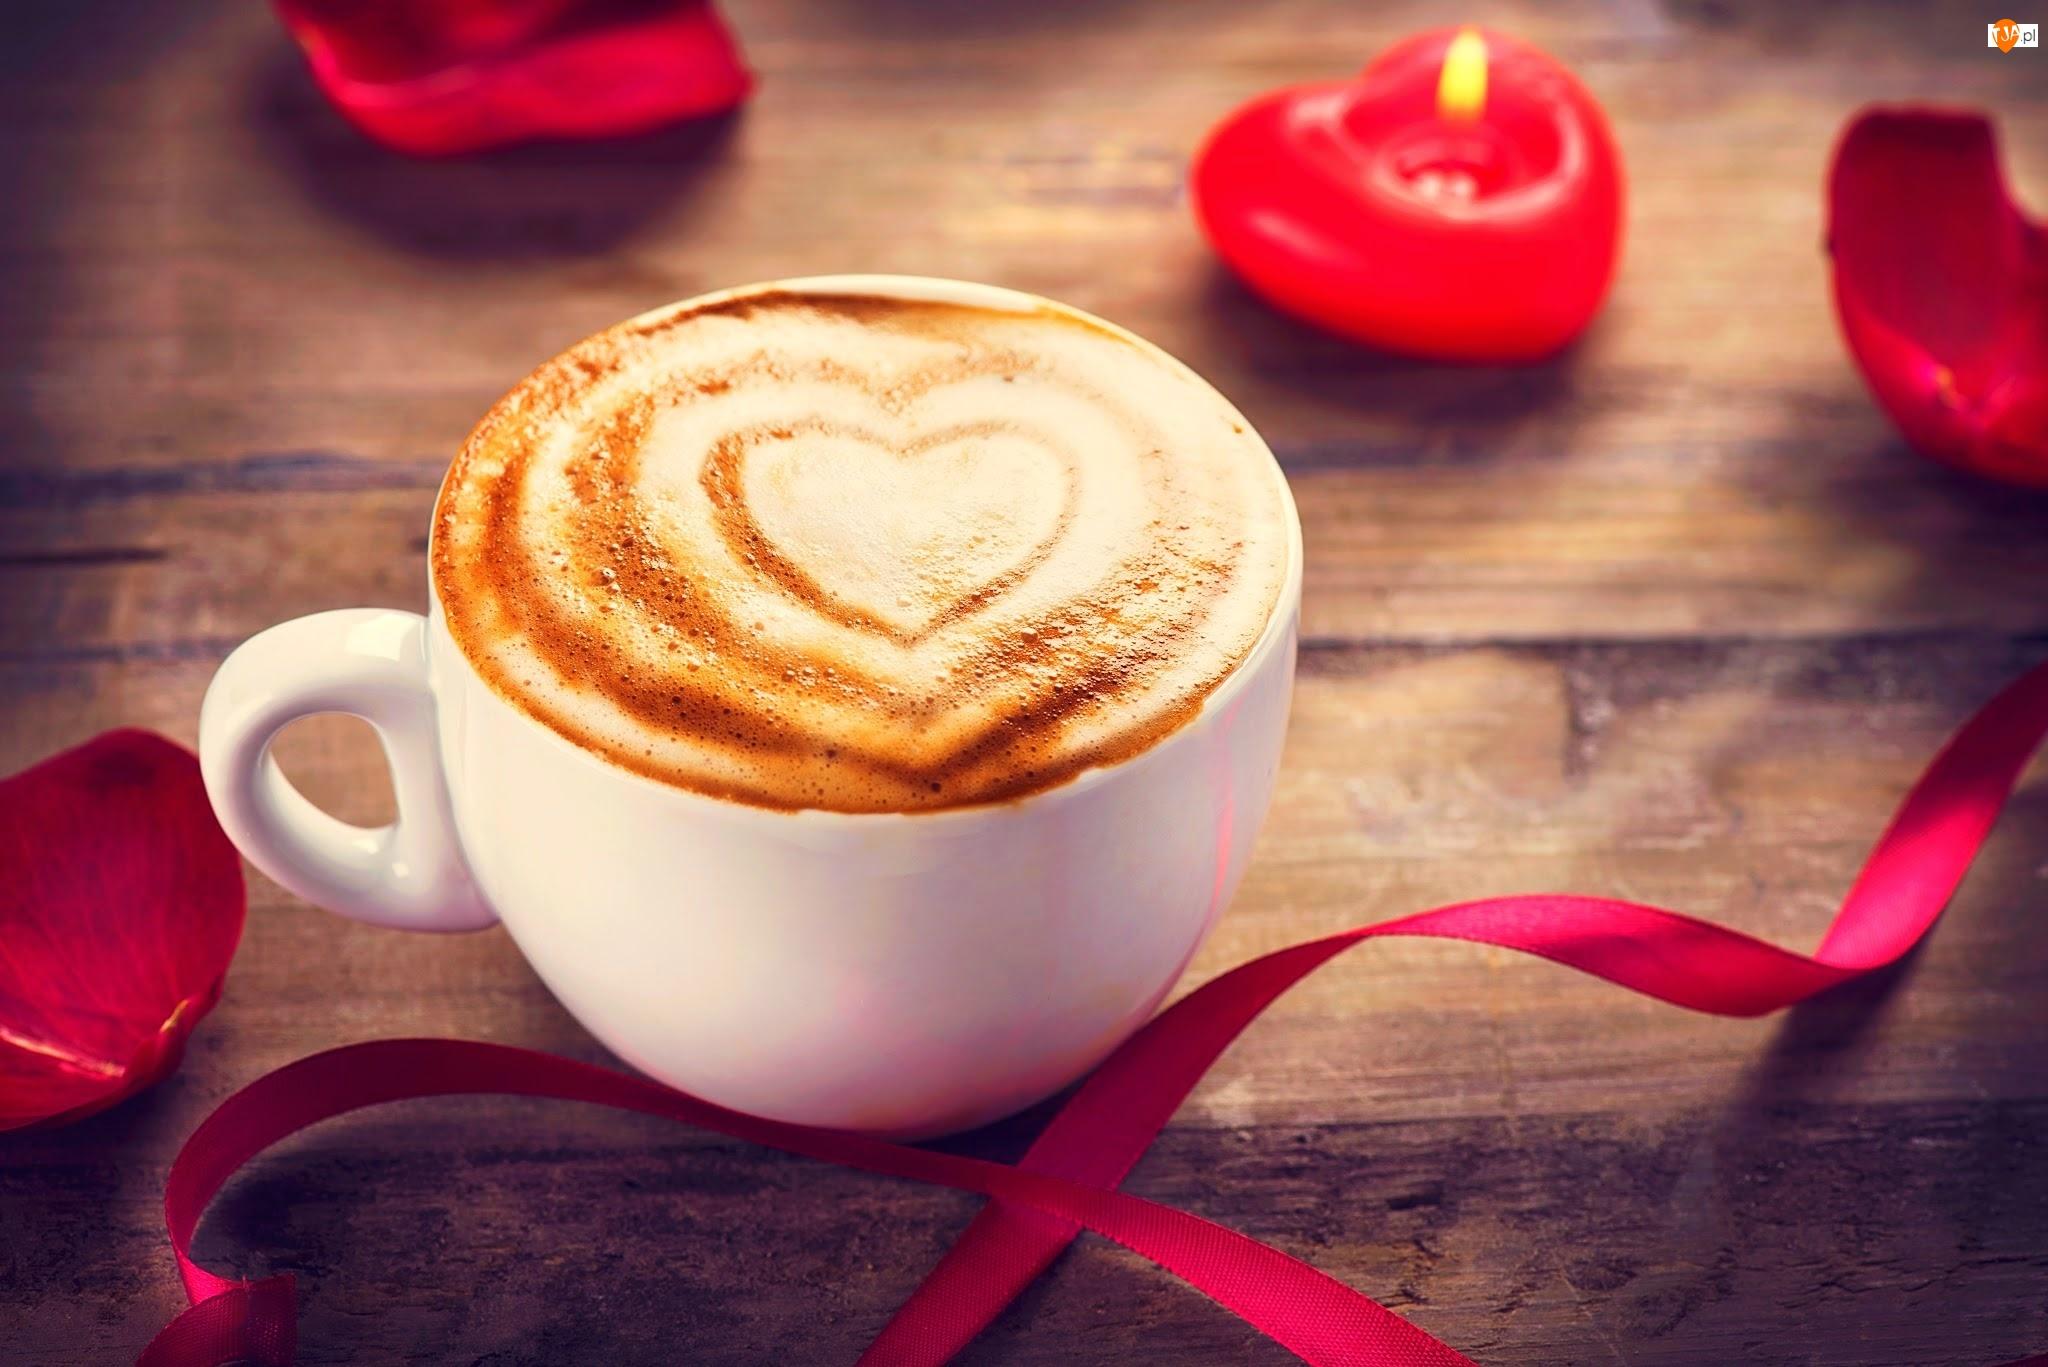 Kawa, Wstążka, Cappuccino, Świeczka